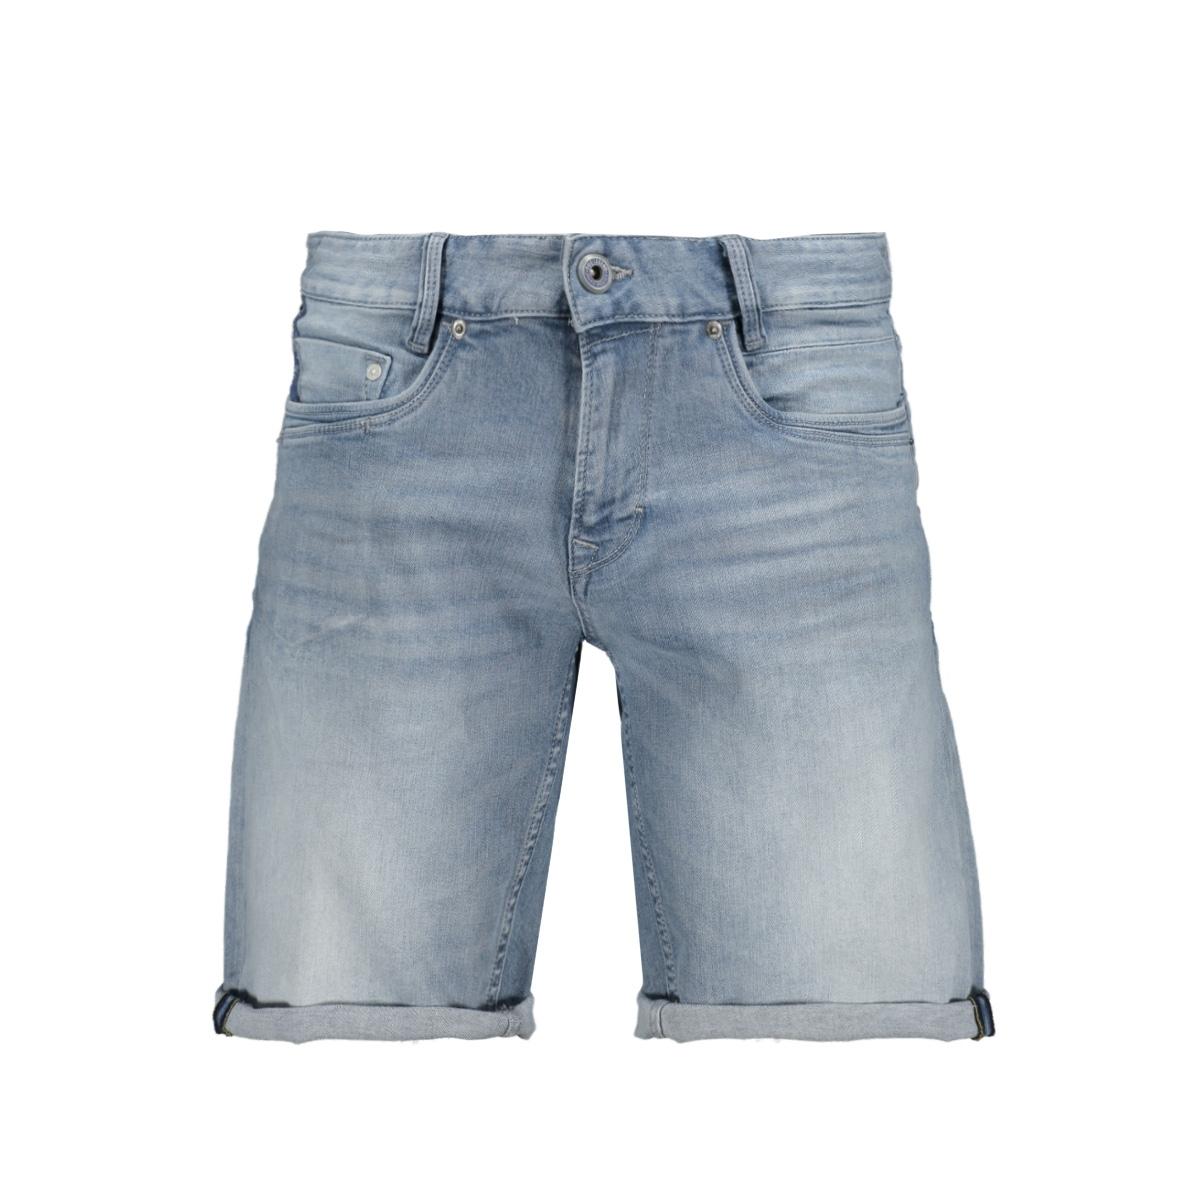 skymaster shorts summer grey bleached psh202757 pme legend korte broek sgb